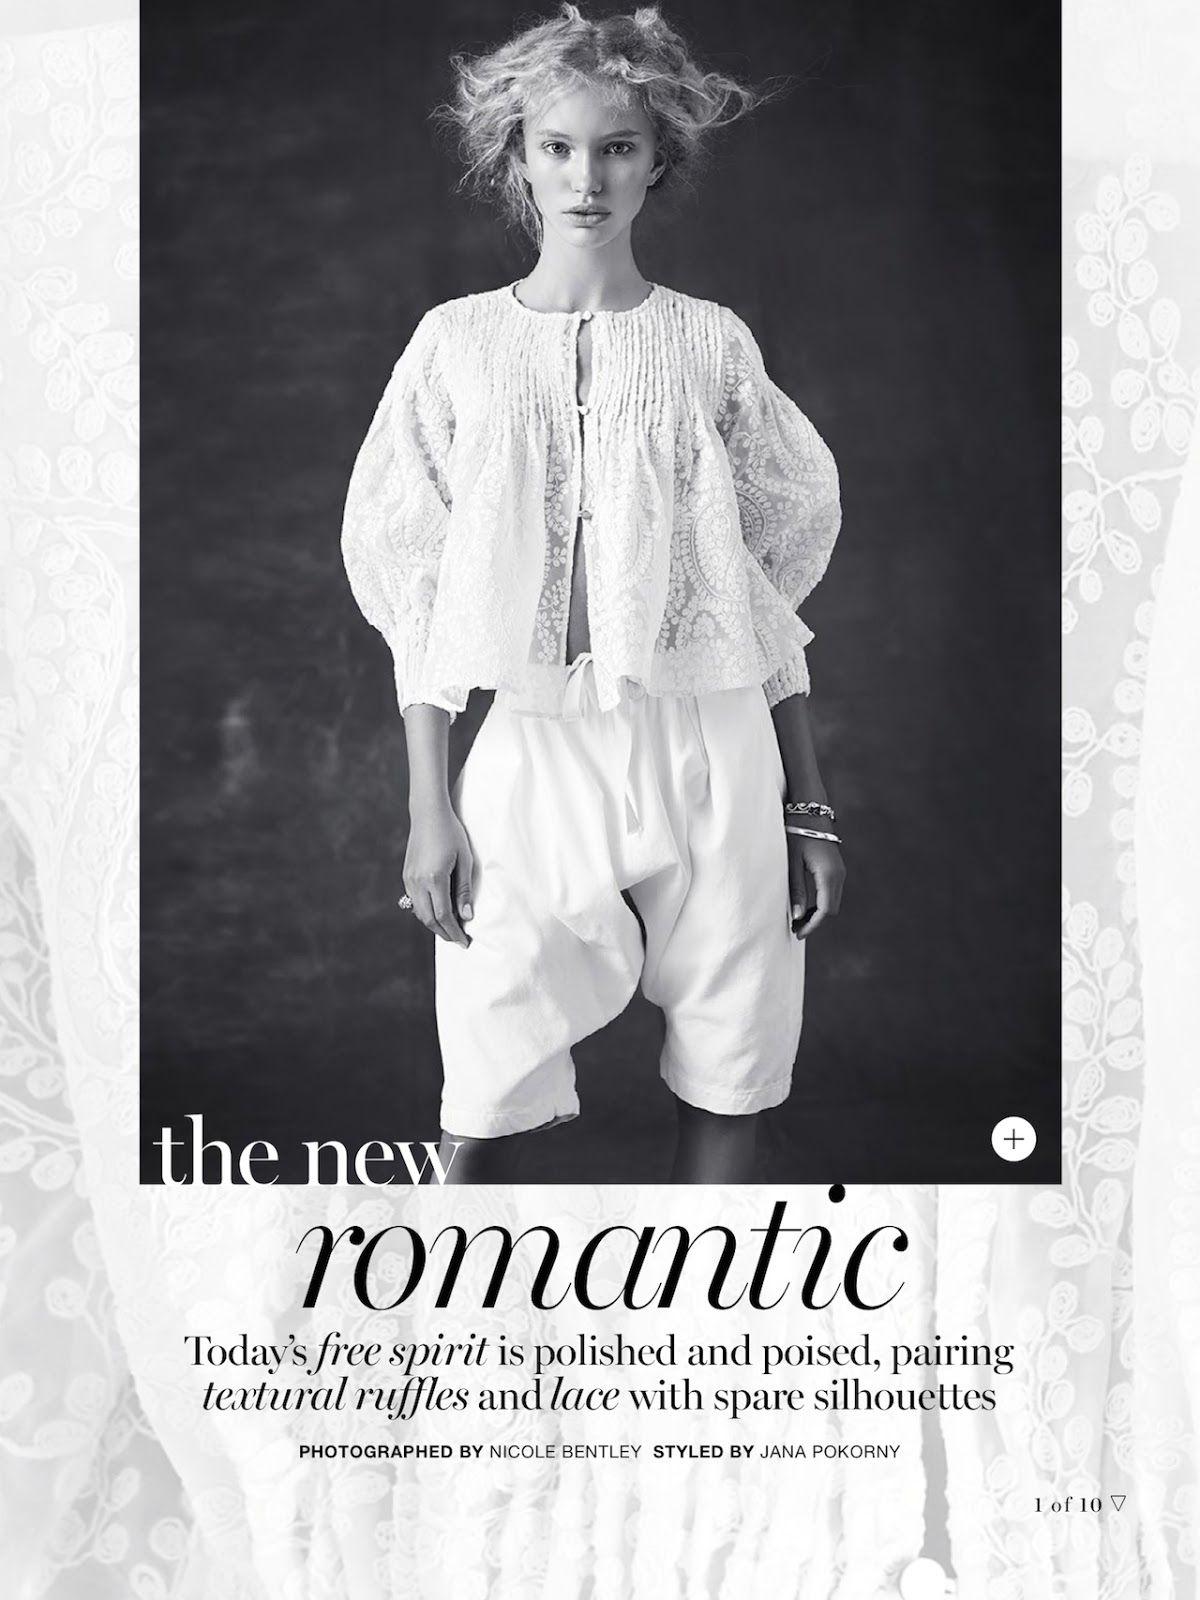 The New Romantic: #KimMcLane by #NicoleBentley for #MarieClaireAustralia November 2014